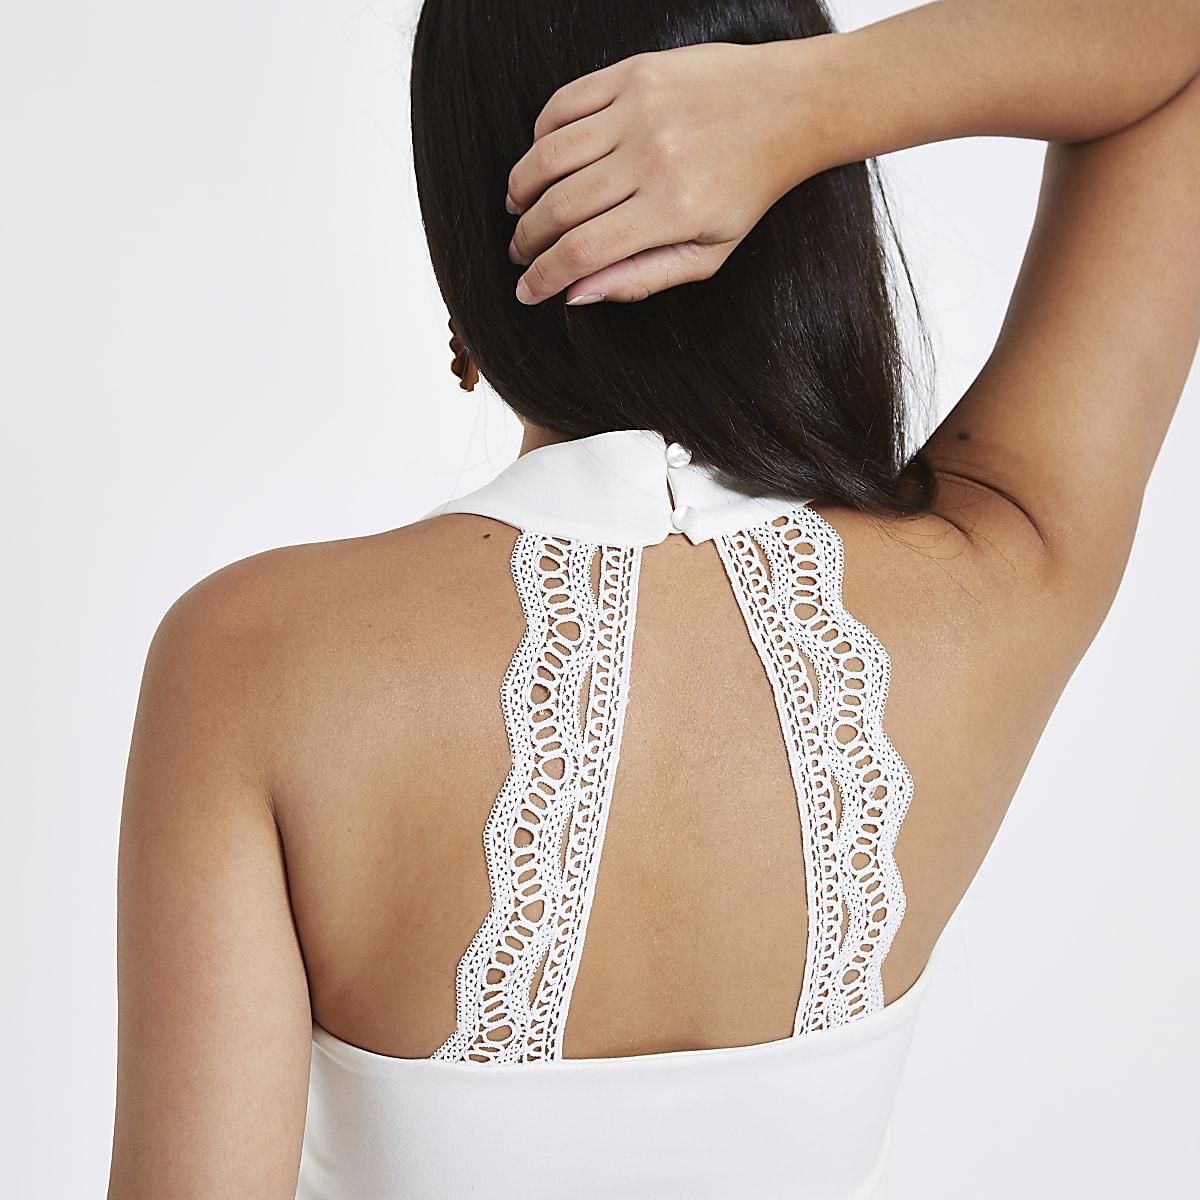 bd07713dfc0 White v neck lace back cropped bralet